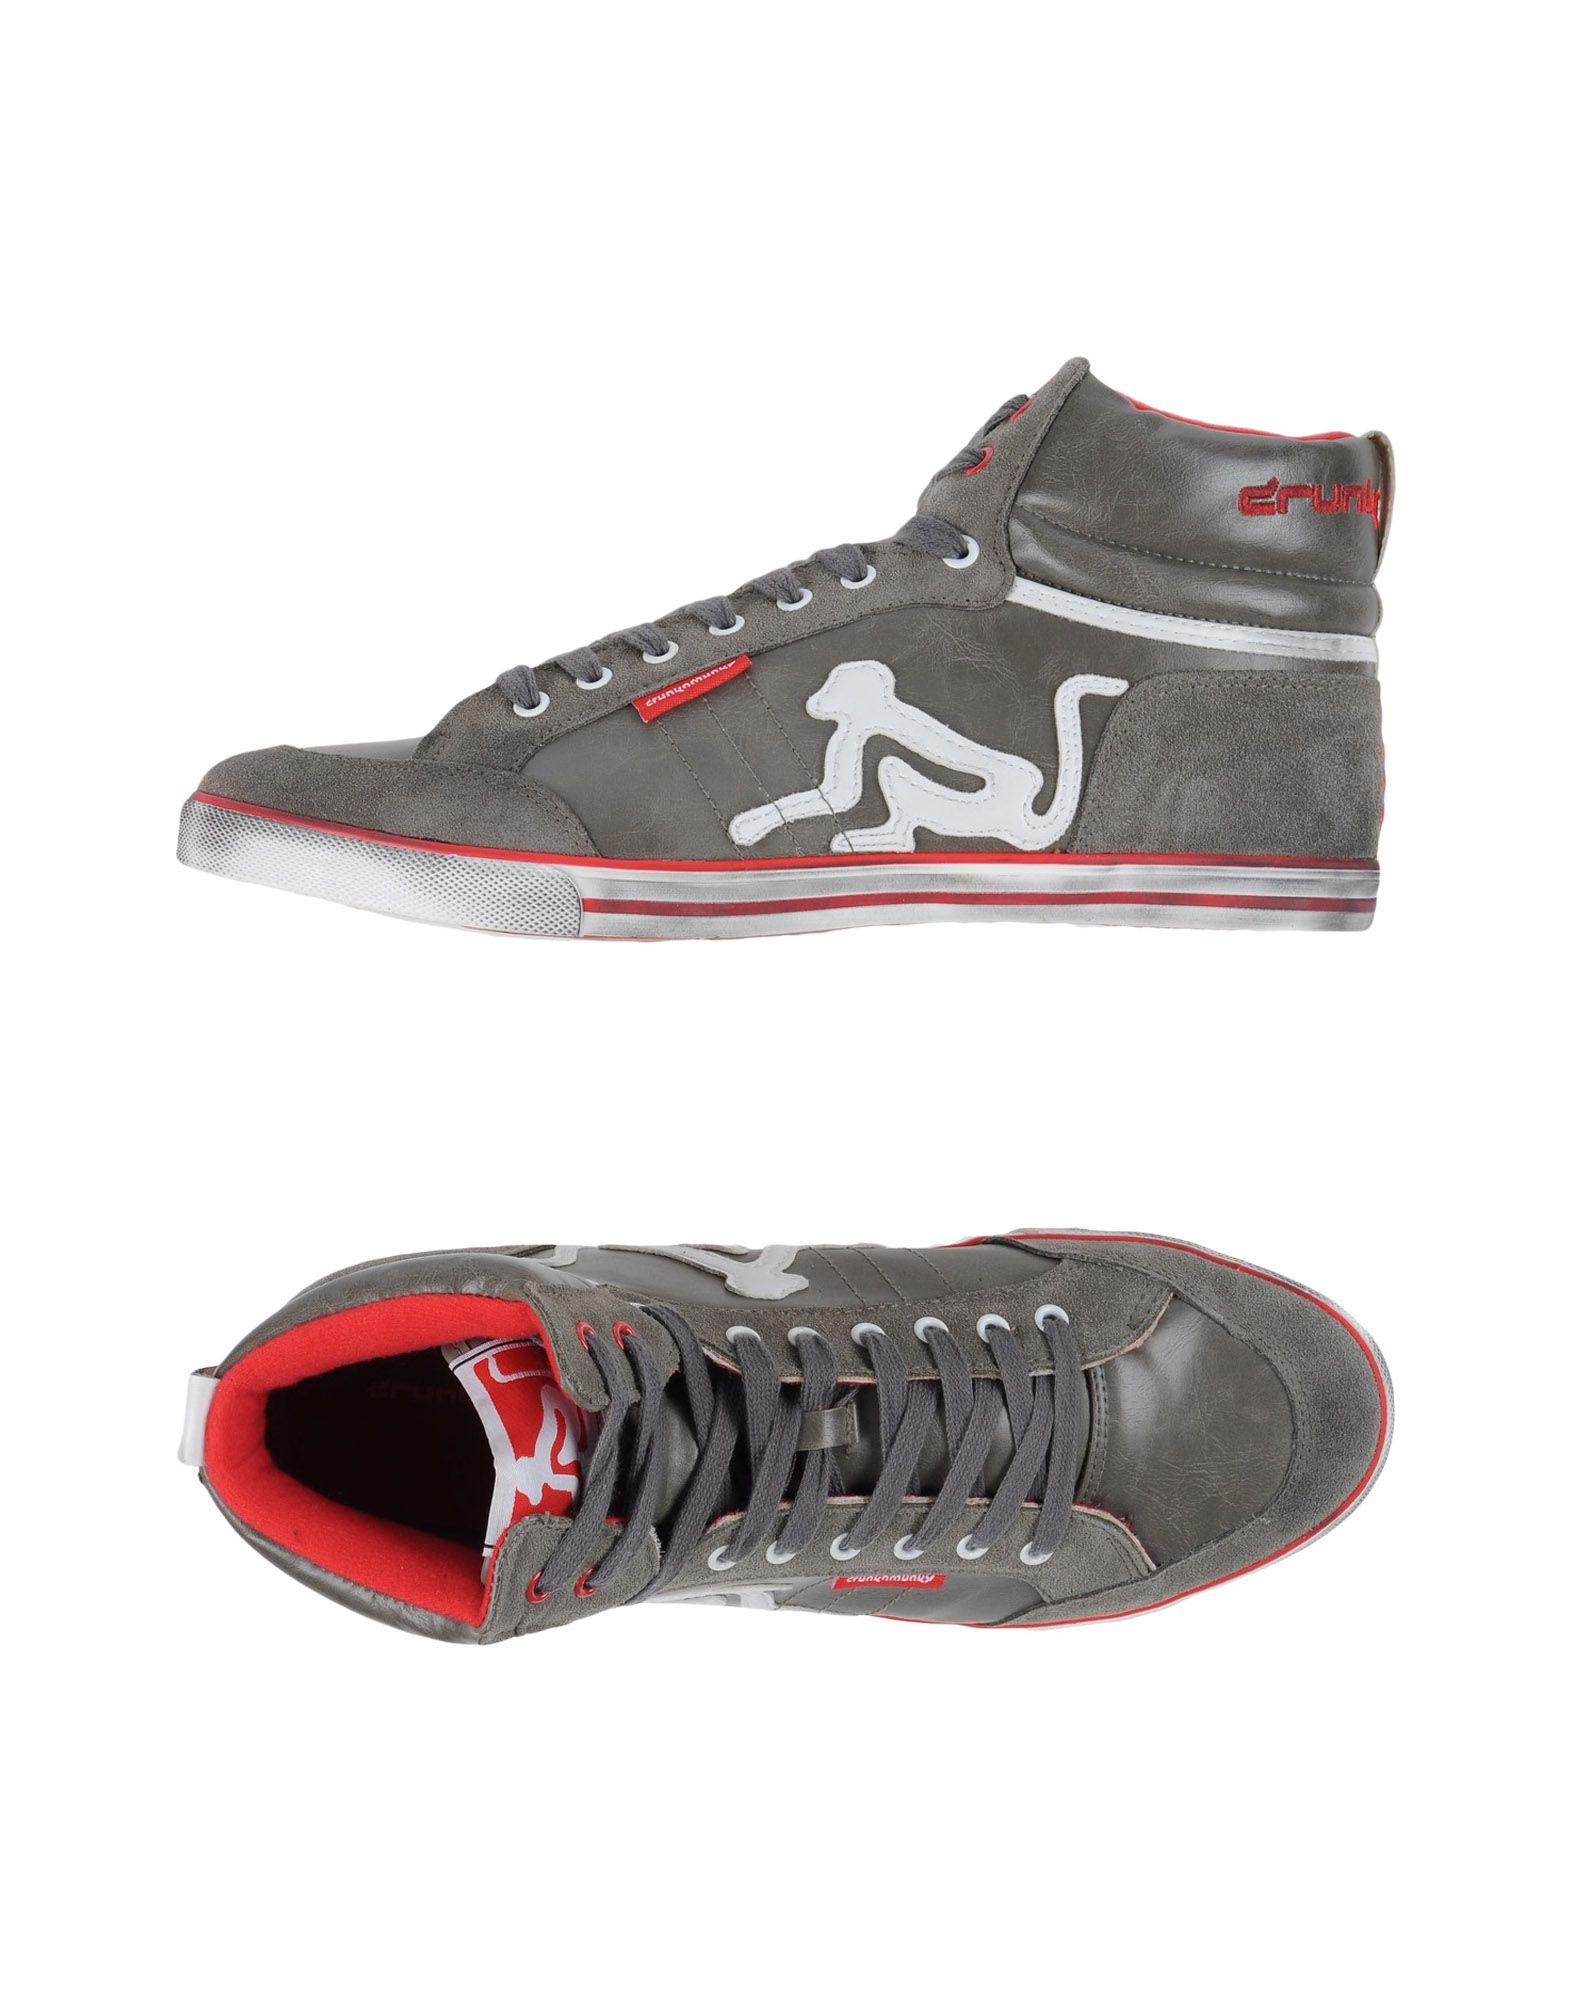 Sneakers Drunknmunky Homme - Sneakers Drunknmunky sur